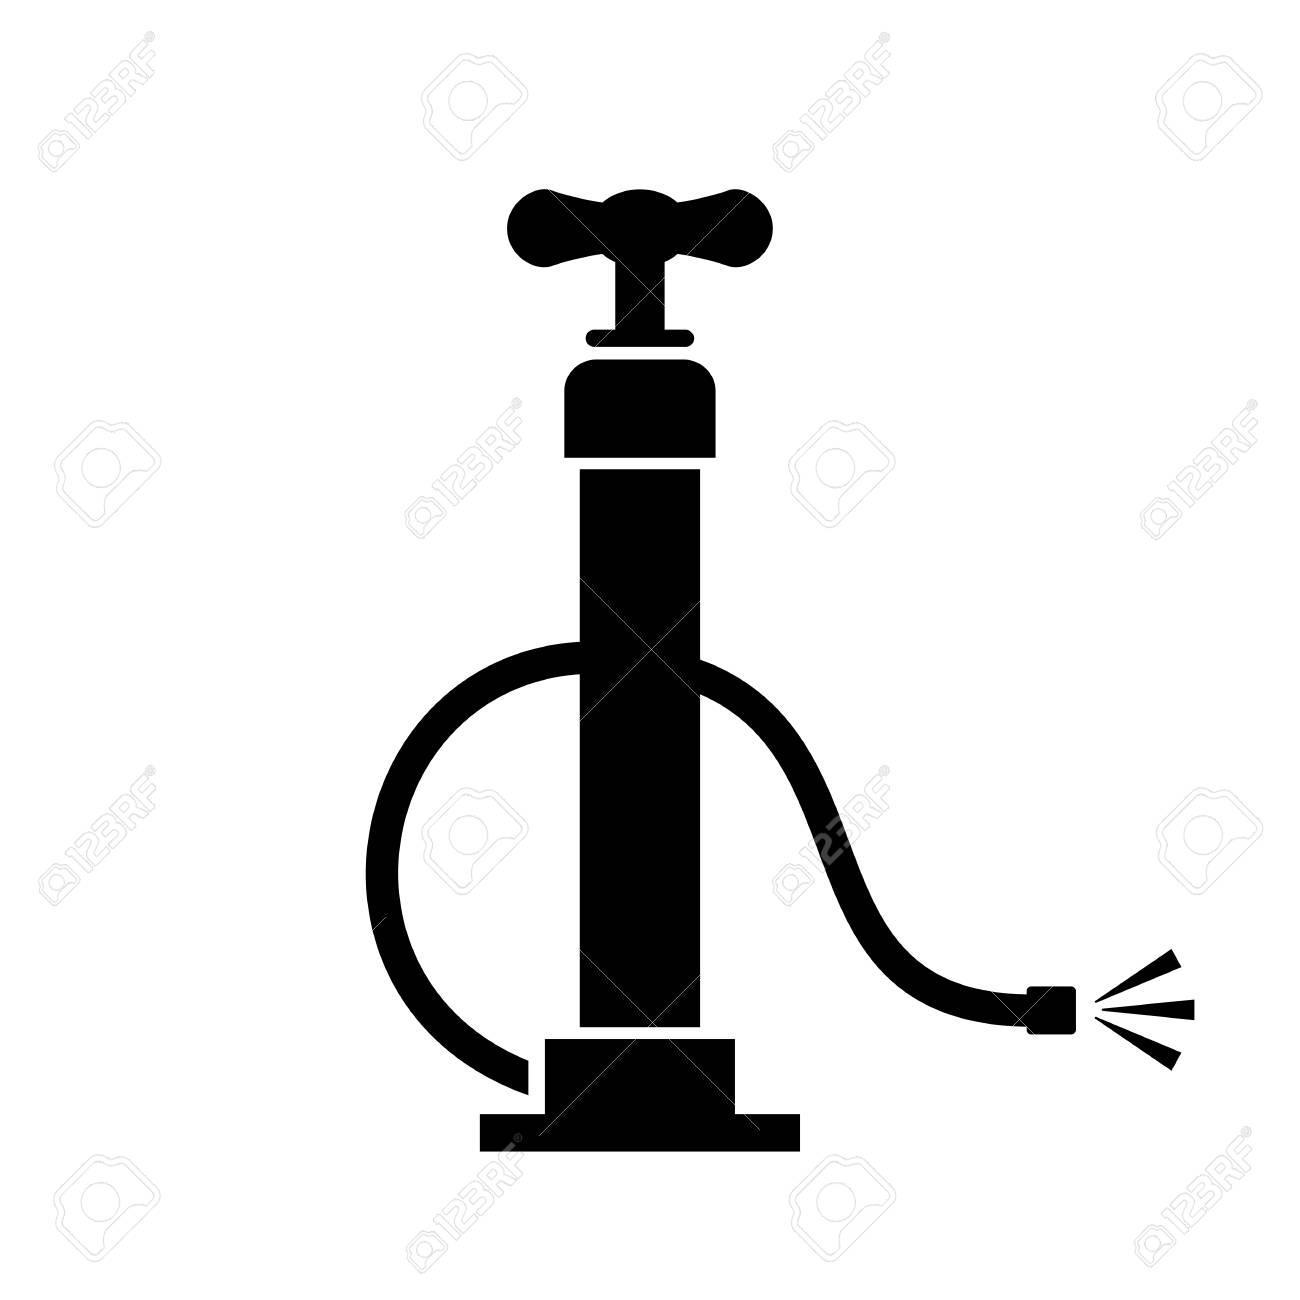 Air pump vector icon - 113030877